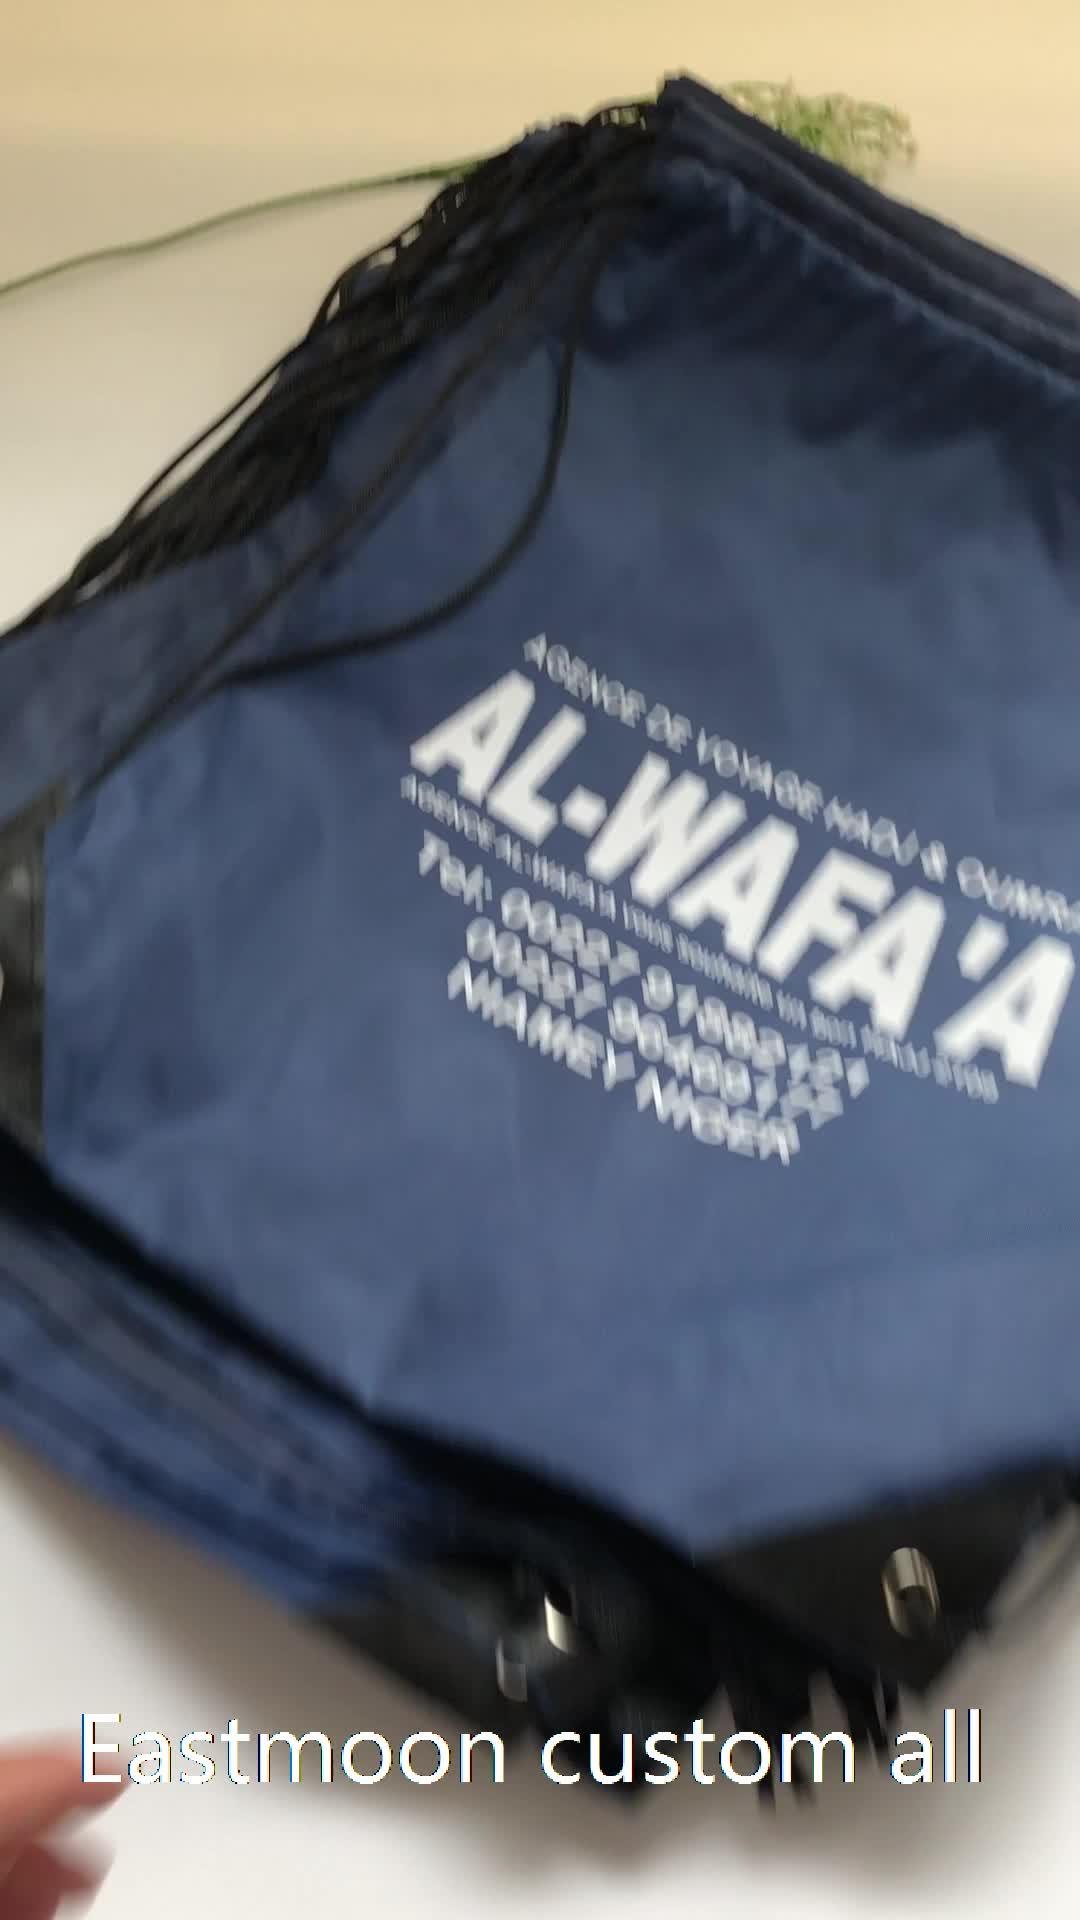 guangzhou manufacturer high quality custom nylon drawstring bag with logo for promotion